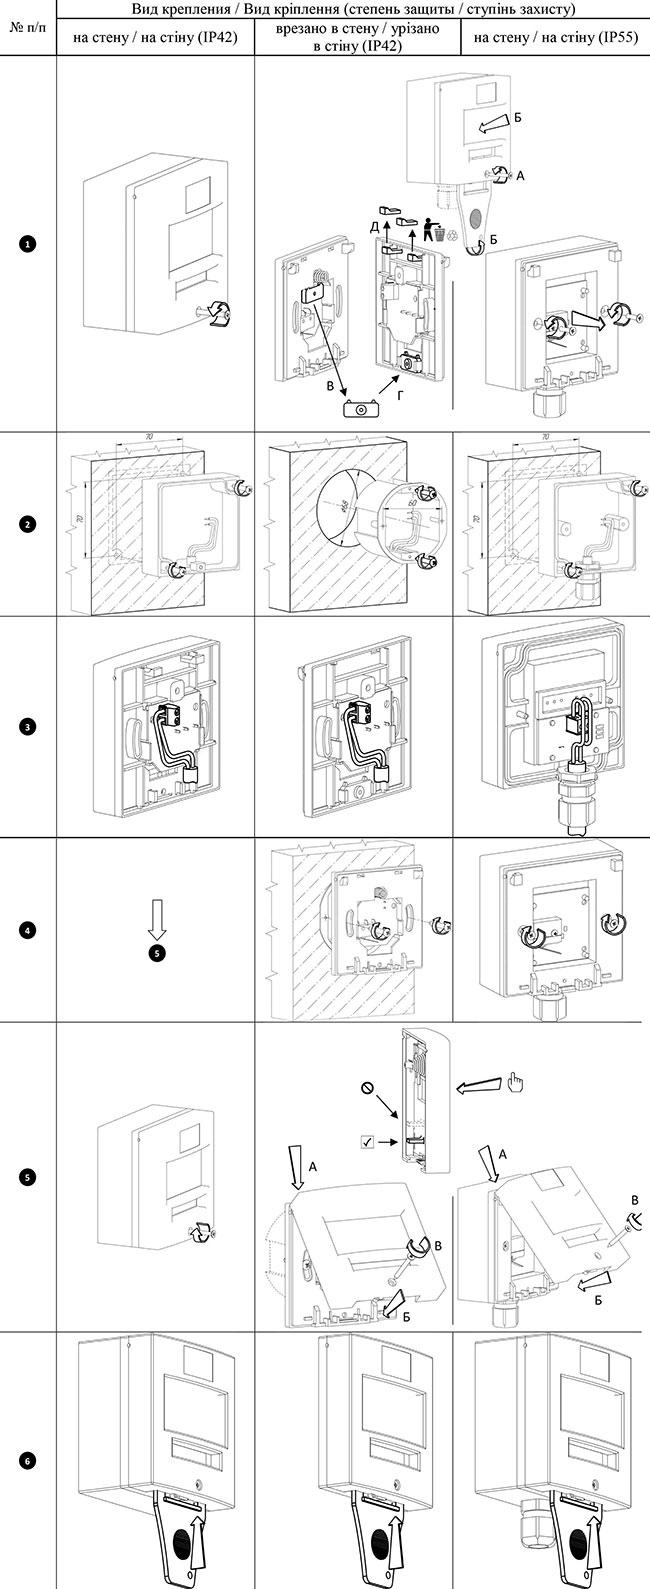 Схема монтажа ручного извещателя Омега СПРА